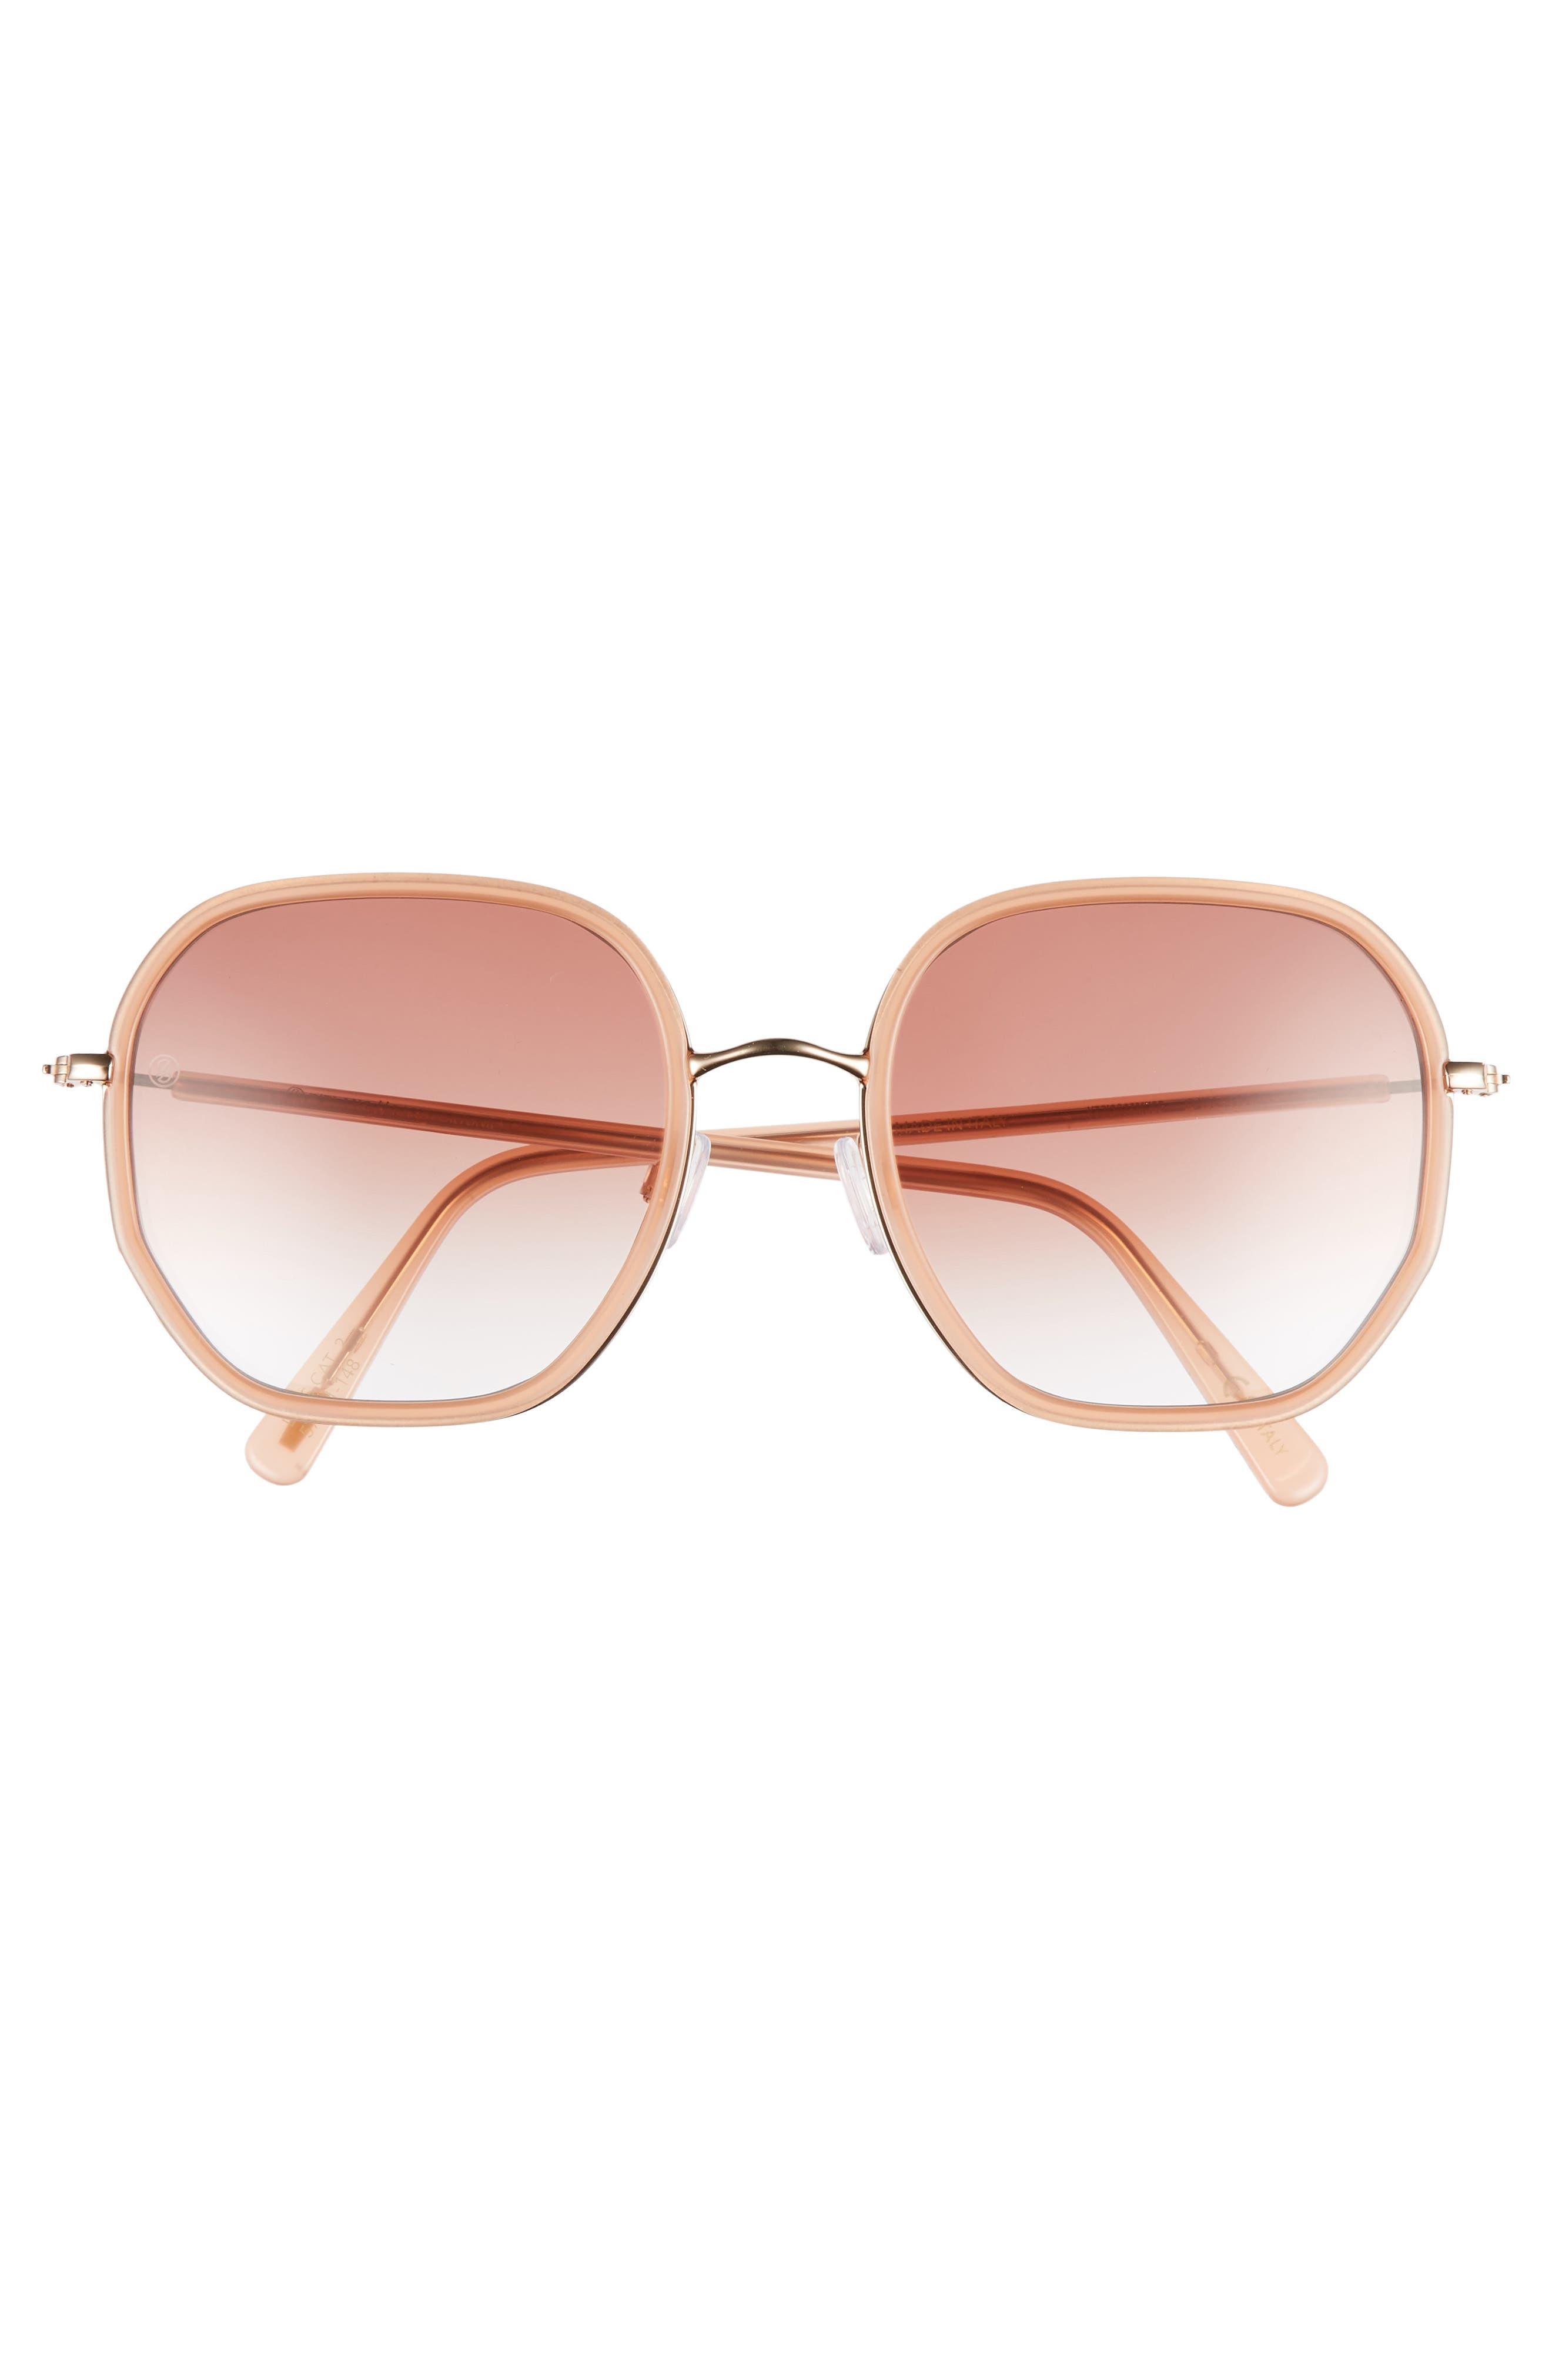 D'BLANC Rare Fortune 57mm Sunglasses,                             Alternate thumbnail 3, color,                             650